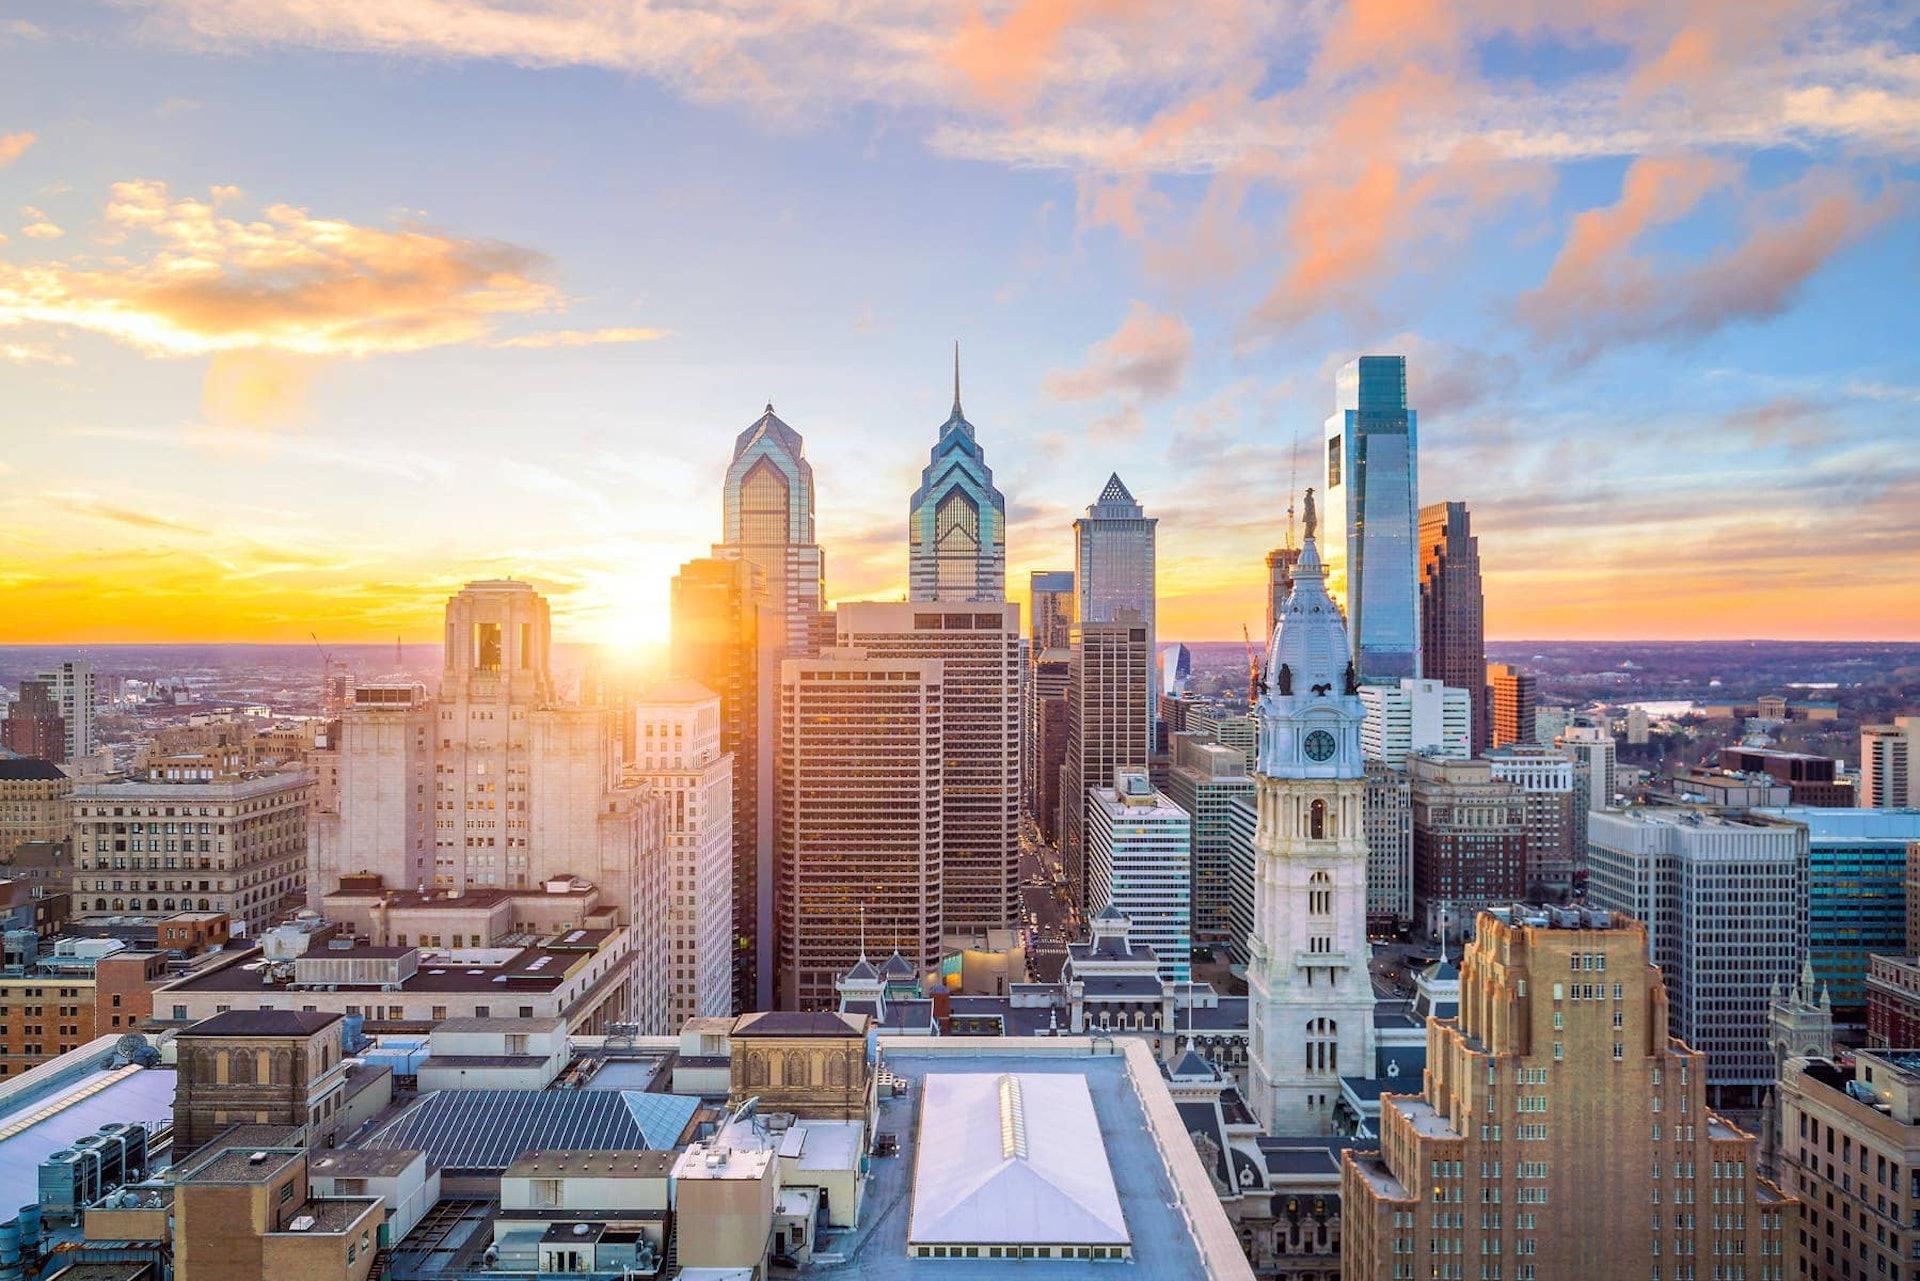 Philadelphia skyline at sunset